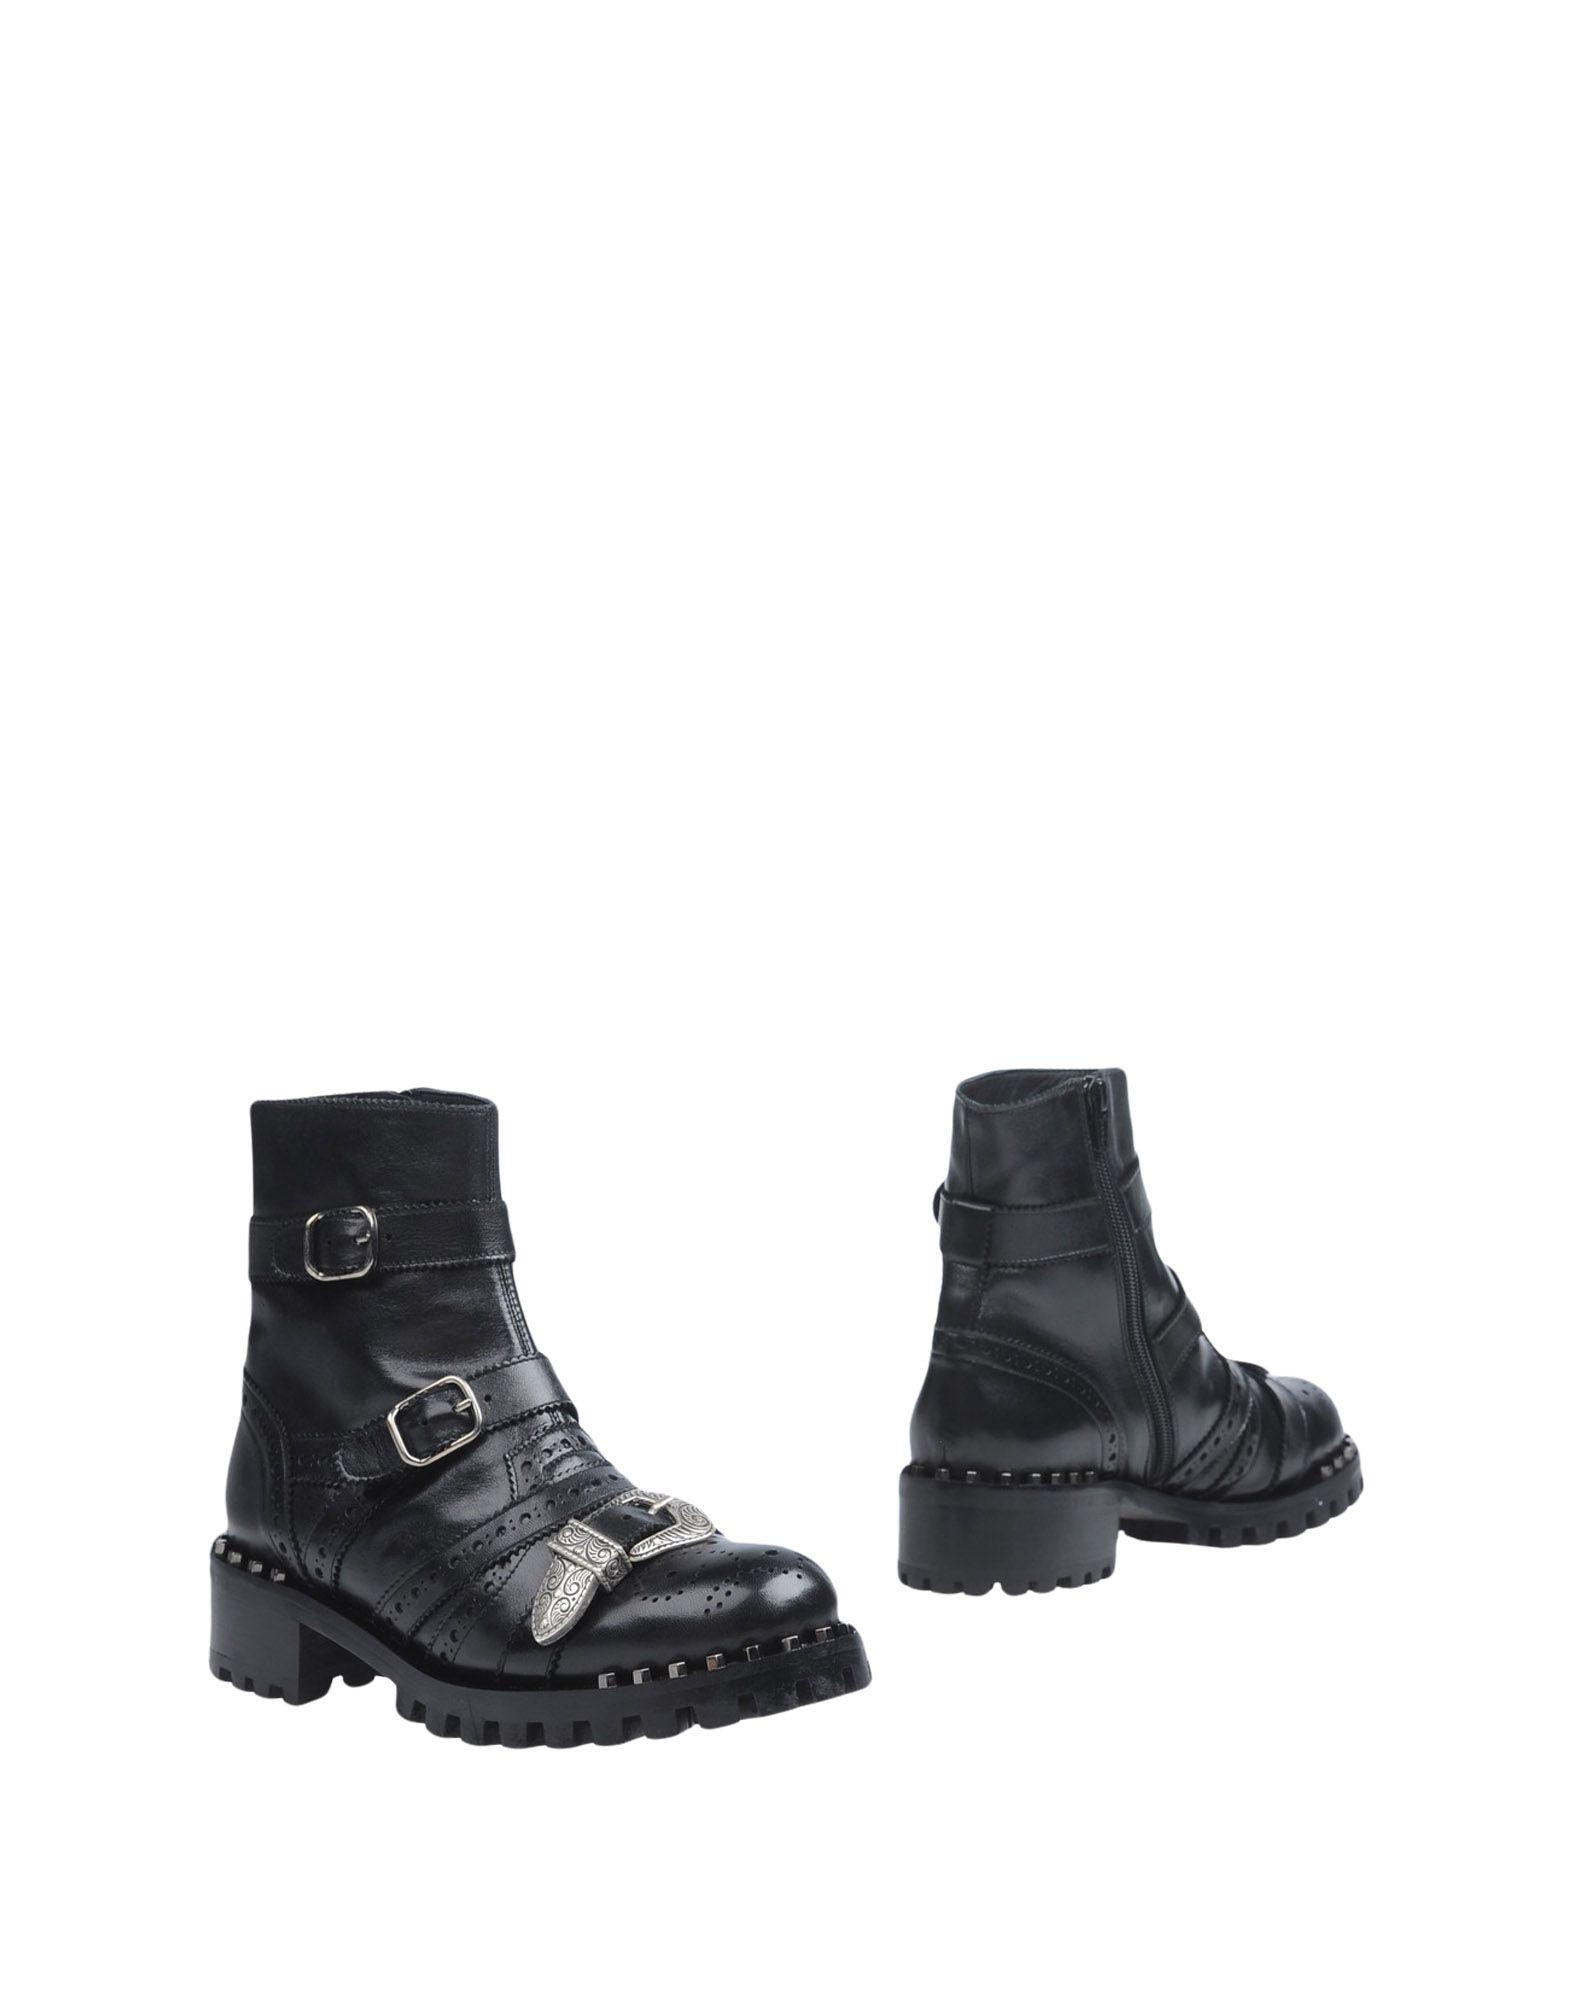 Ras Ankle Ankle Boot - Women Ras Ankle Ankle Boots online on  United Kingdom - 11354877MS 7666d2